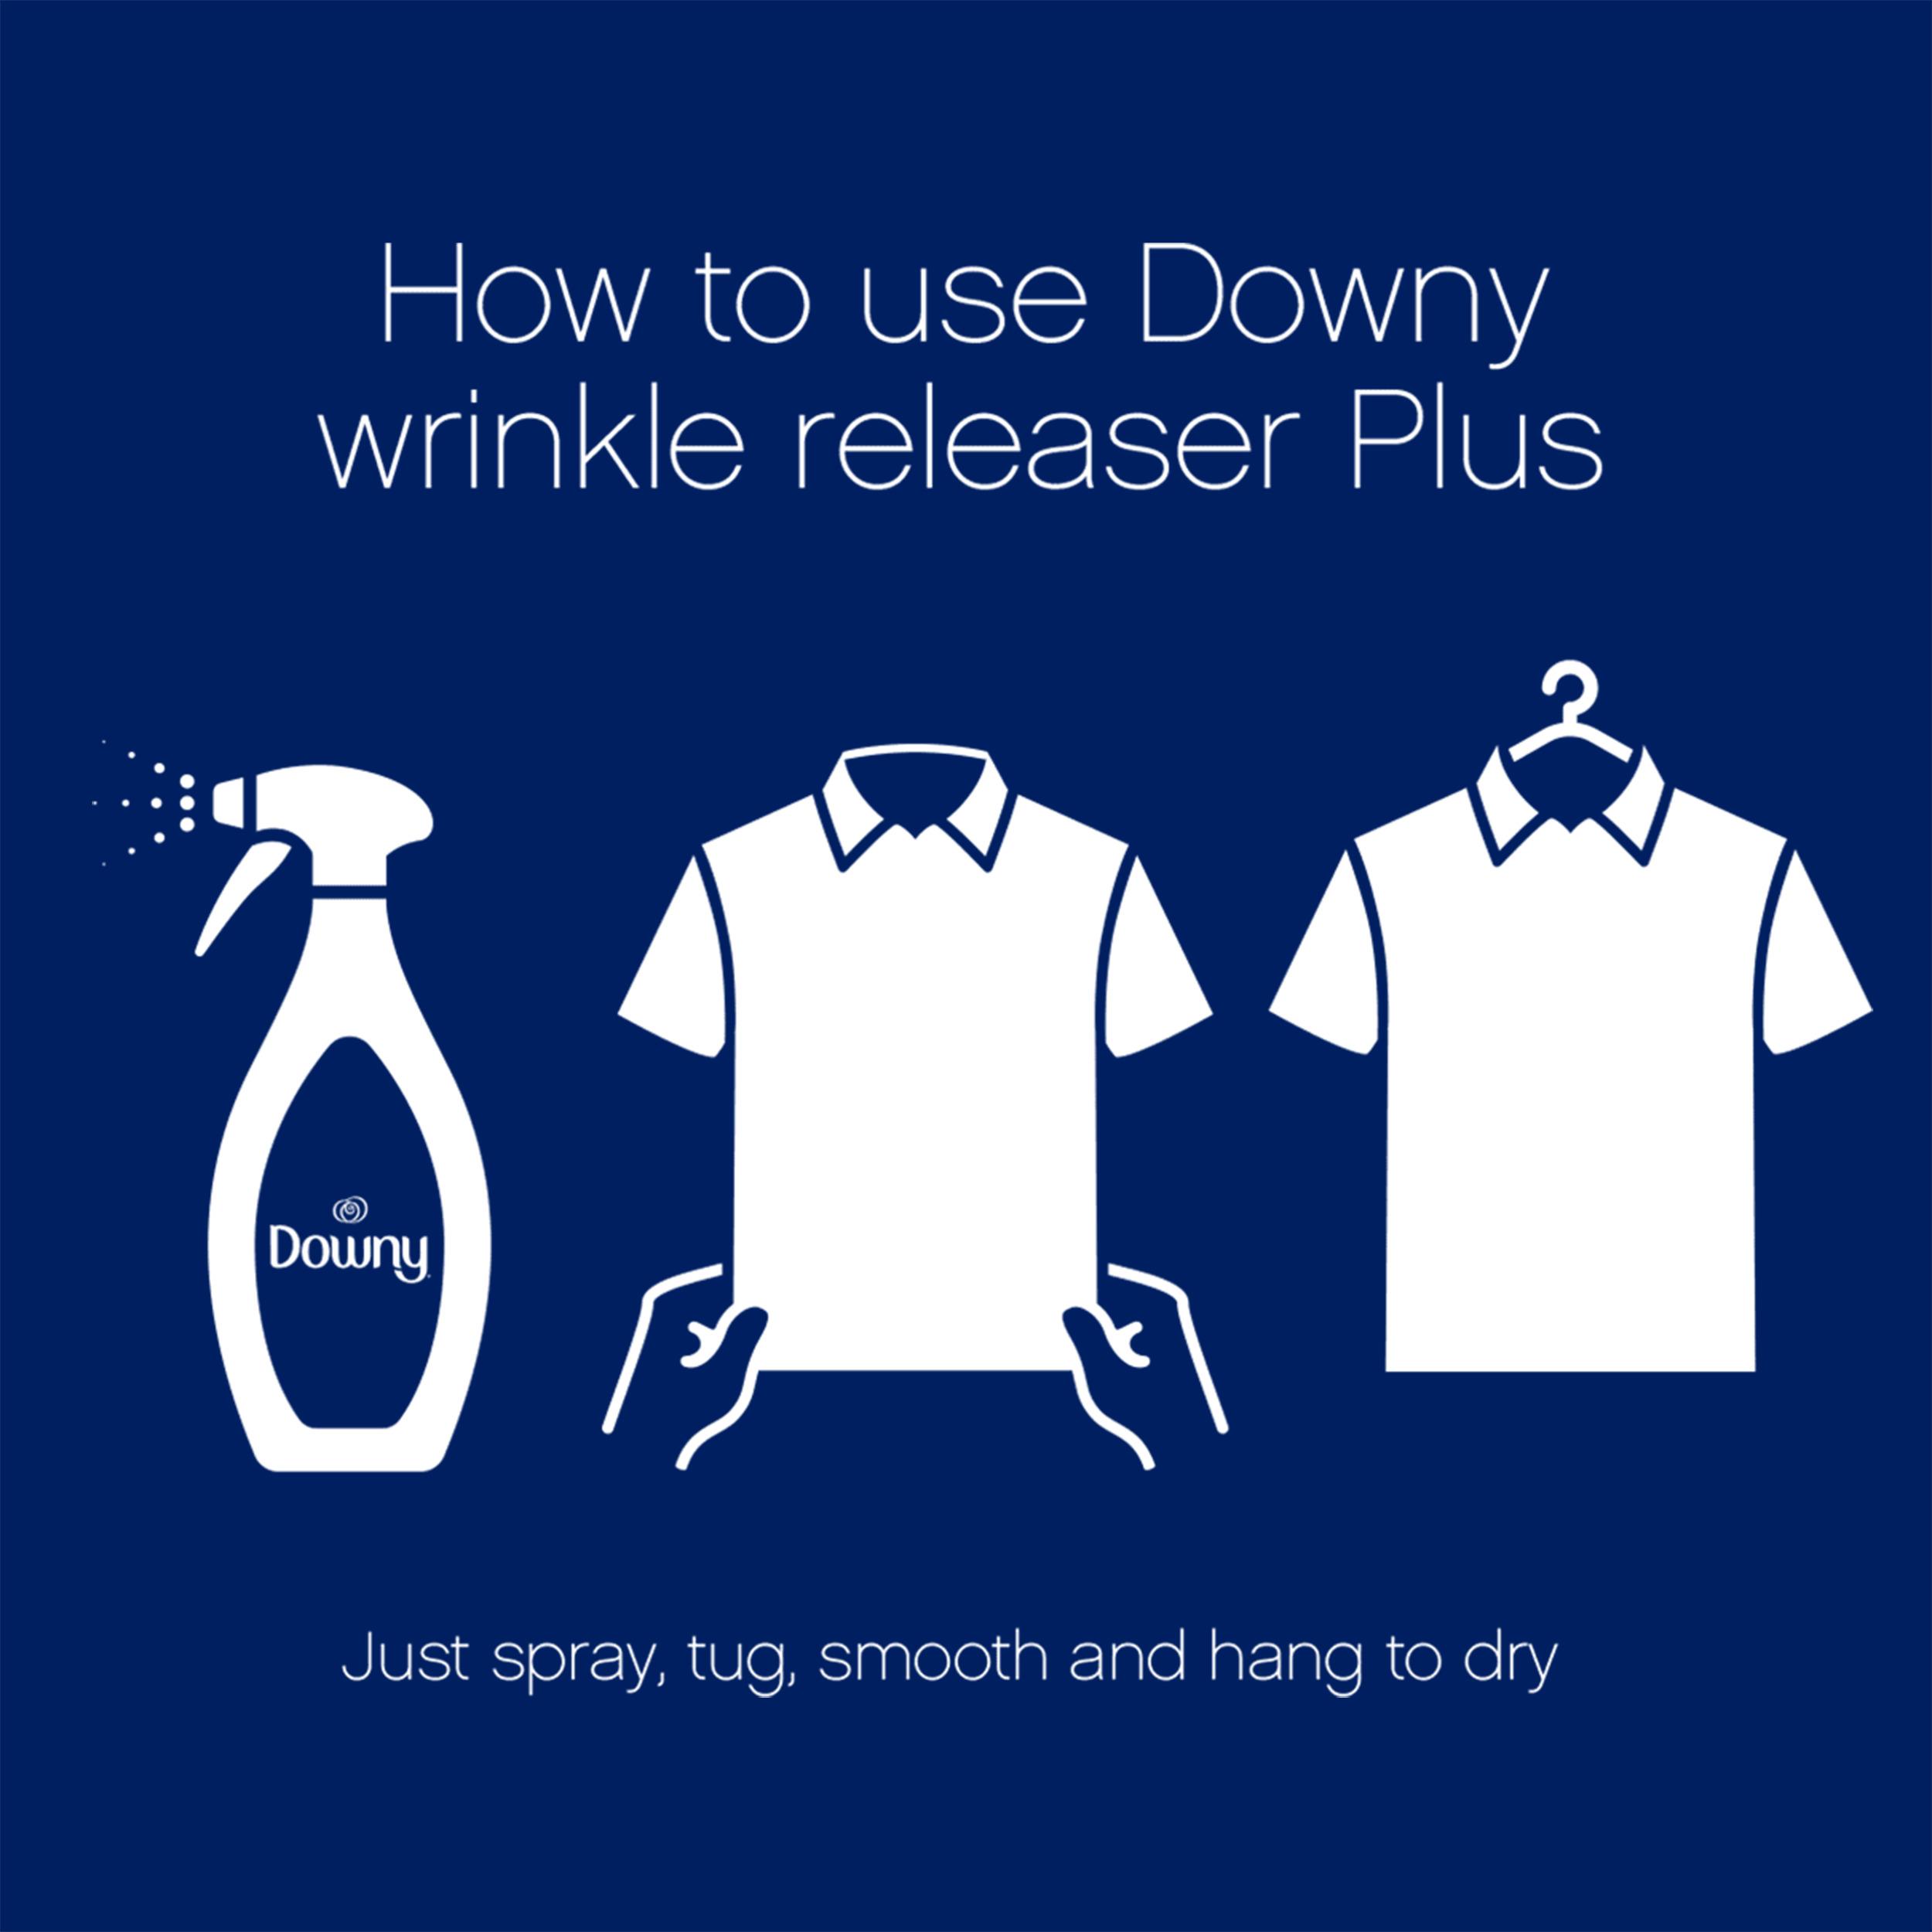 Downy Wrinkle Releaser Fabric Refresher, Light Fresh Scent, 16.9 fl oz